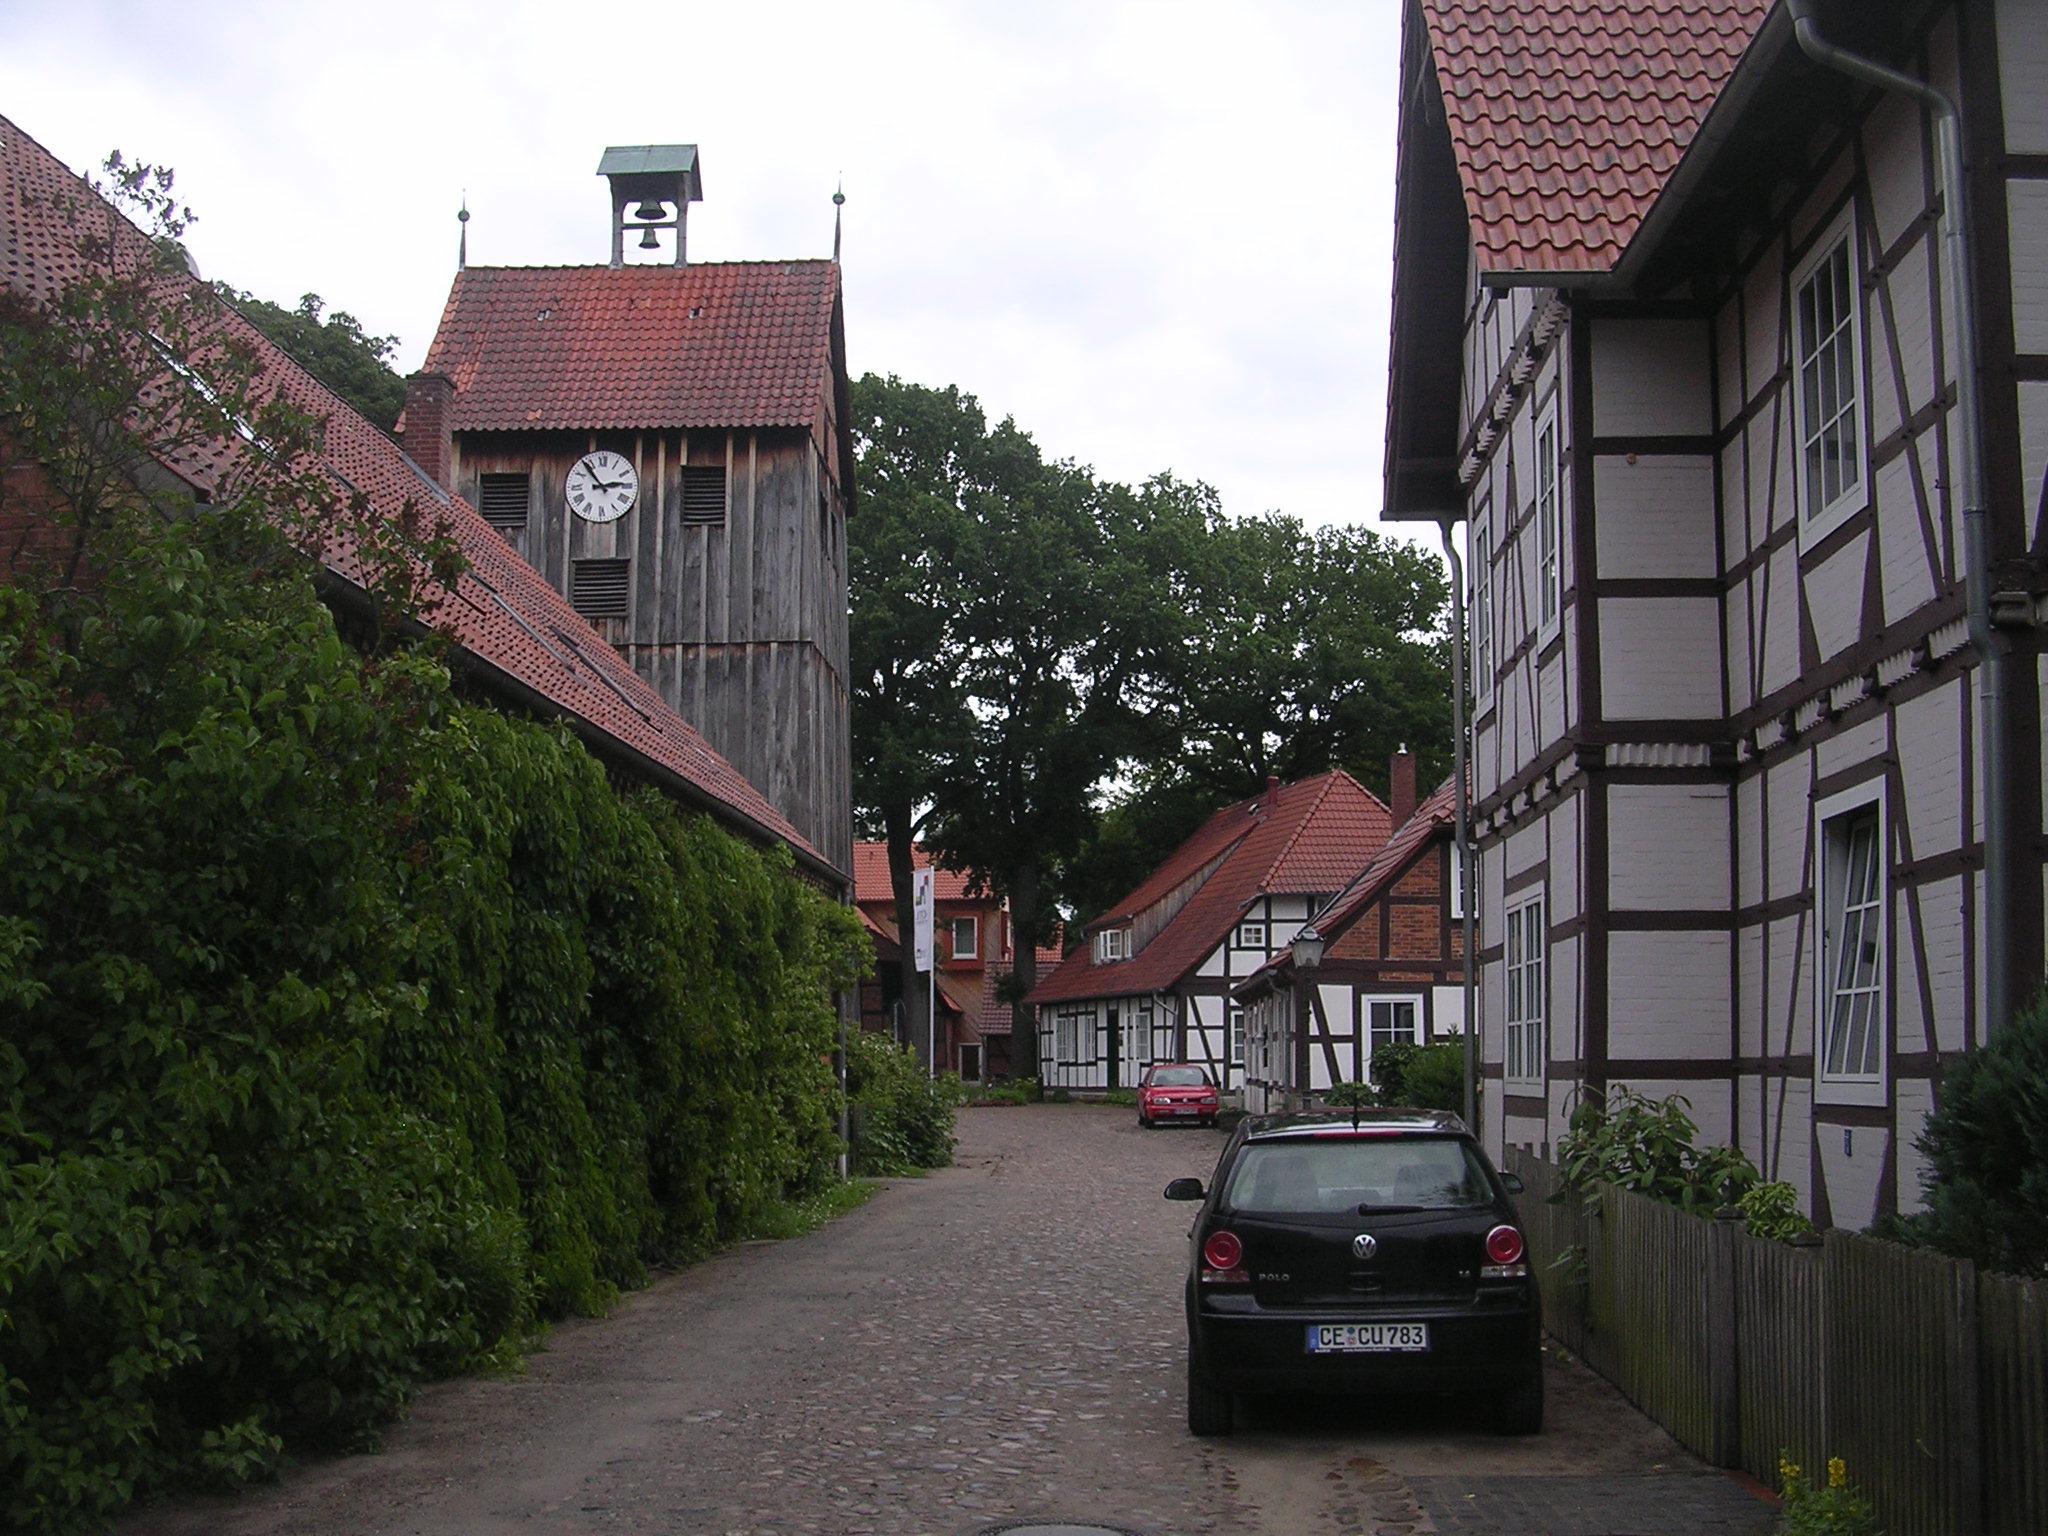 v-wienhausen-ce